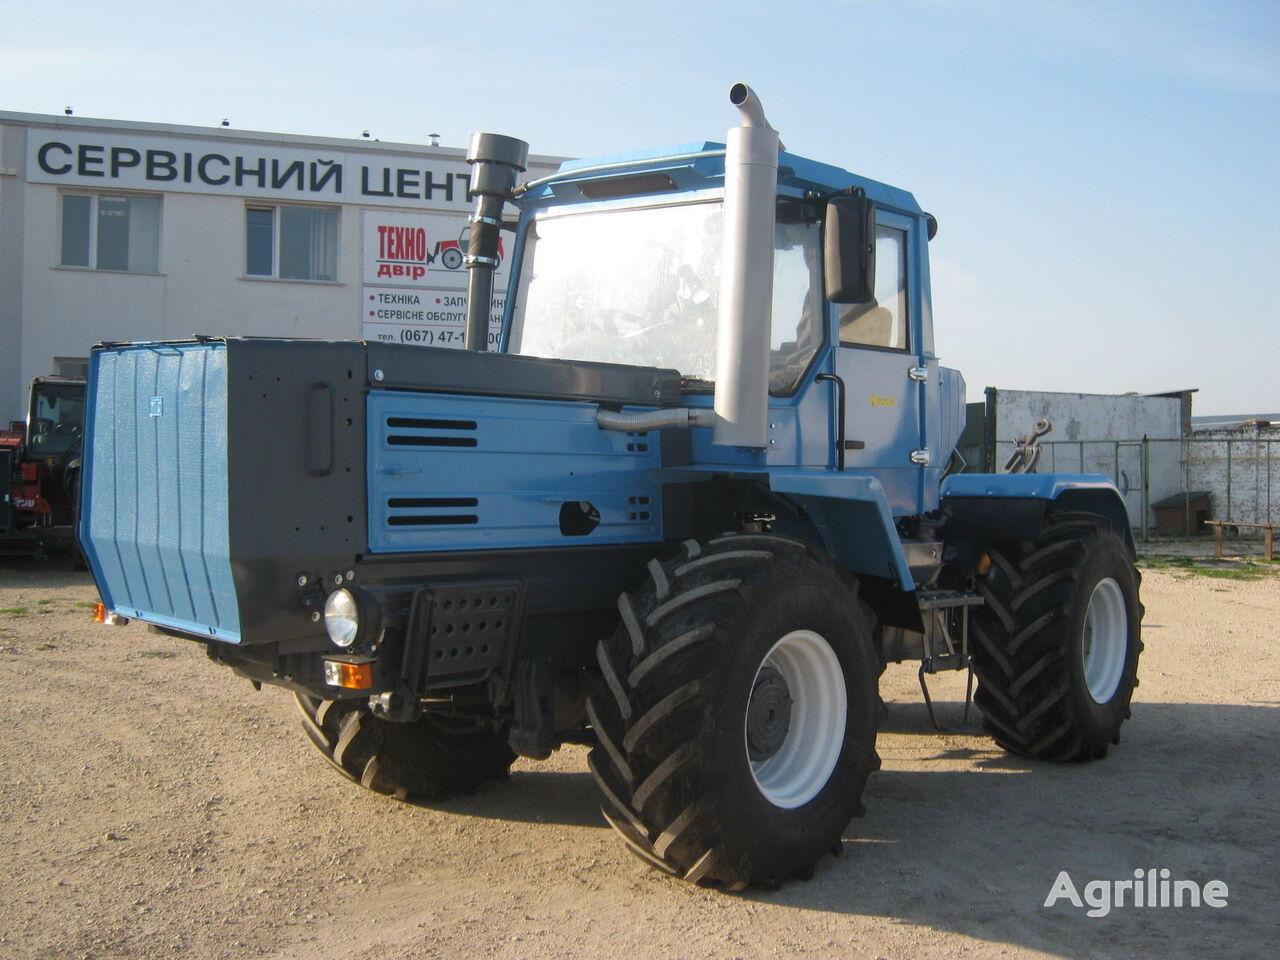 HTZ T-150 VIDNOVLENIY trator de rodas